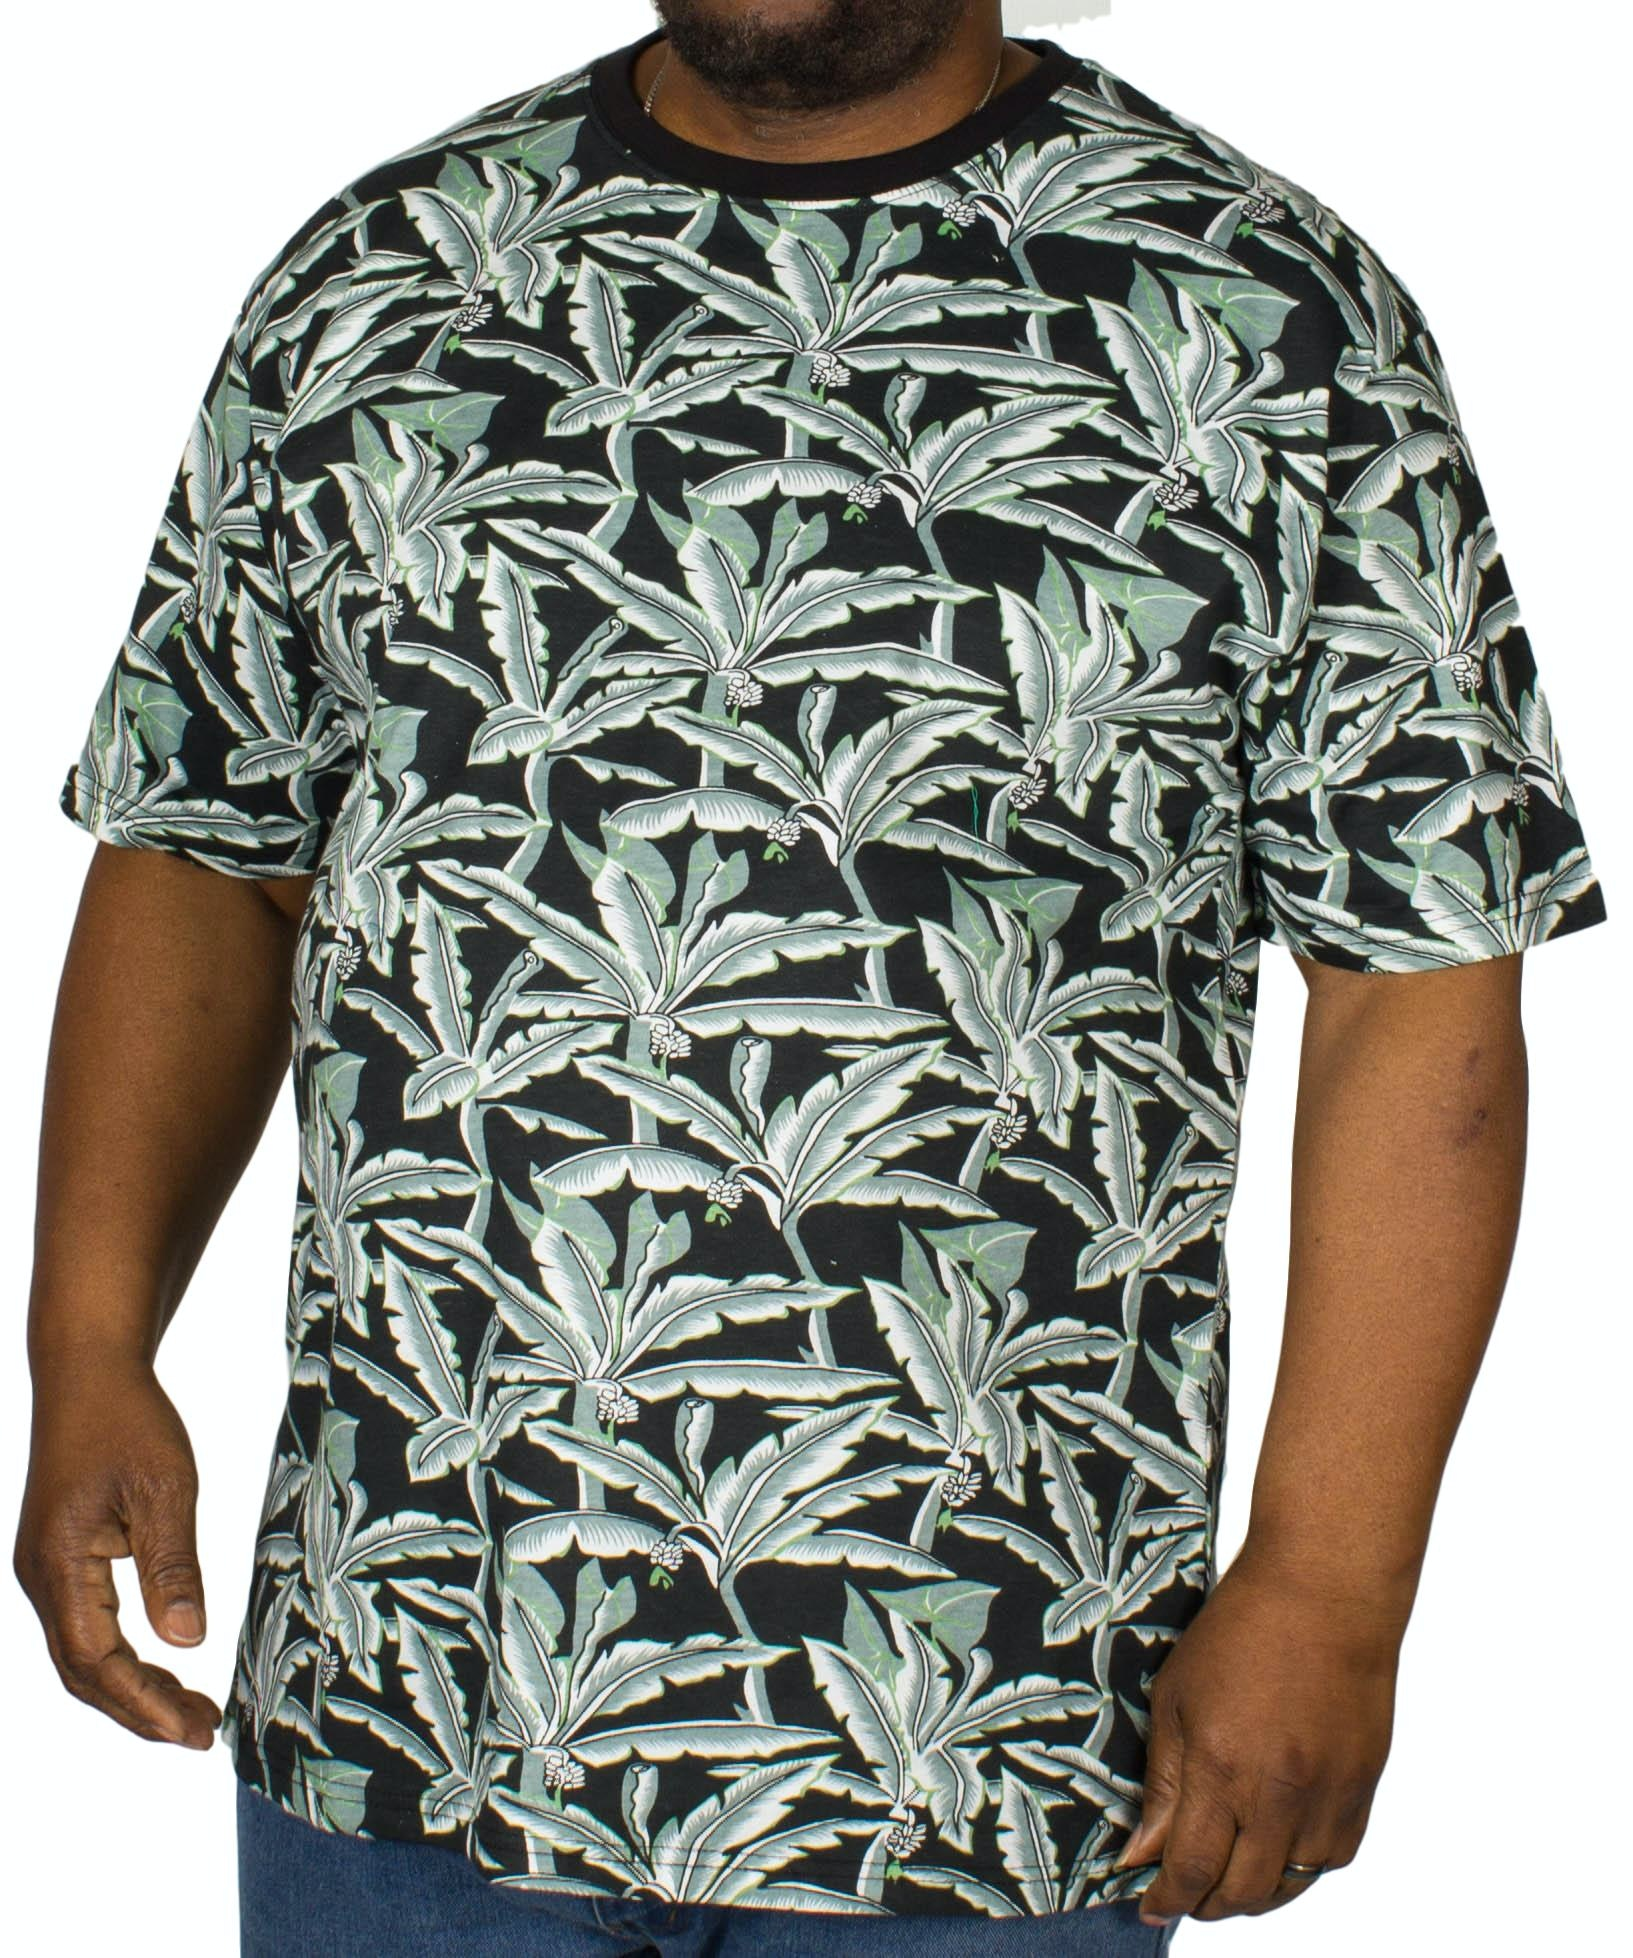 KAM Floral Print T-Shirt Black